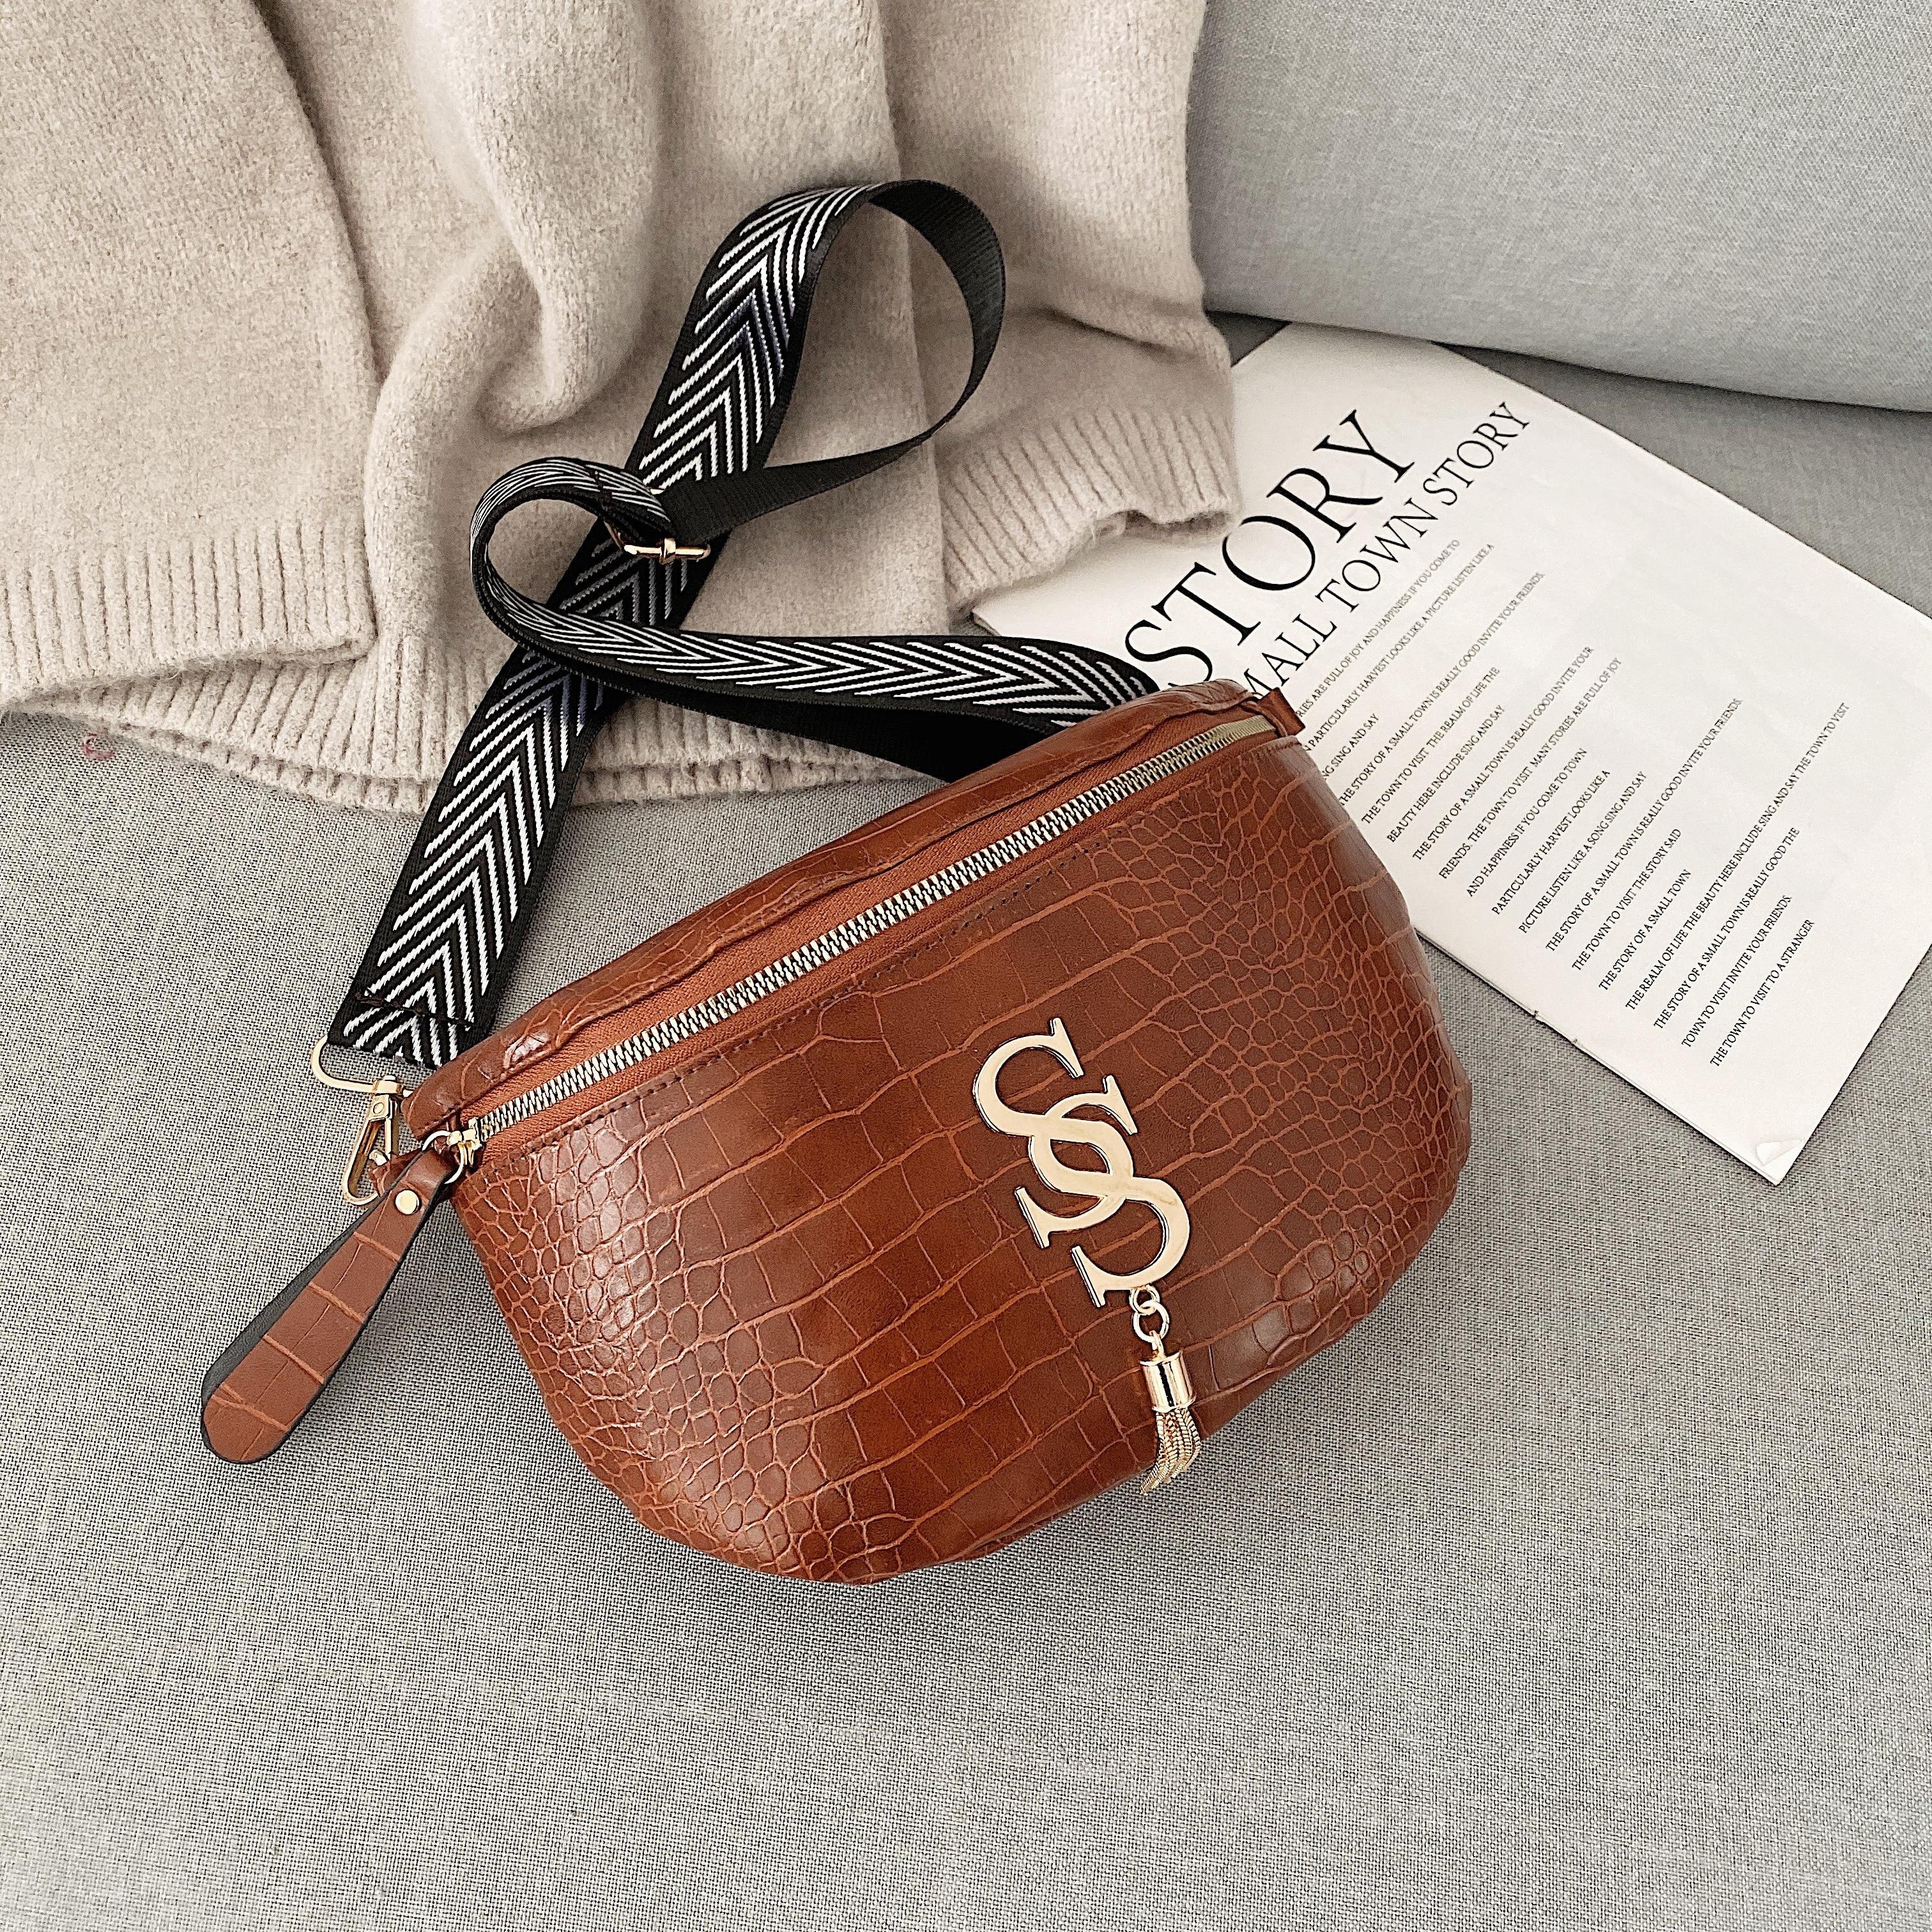 Women Bag Casual Waist Bag Leather Crossbody Bag Trendy Chest Bag Casual Belt Bag For Women 2020 Female Bolsa